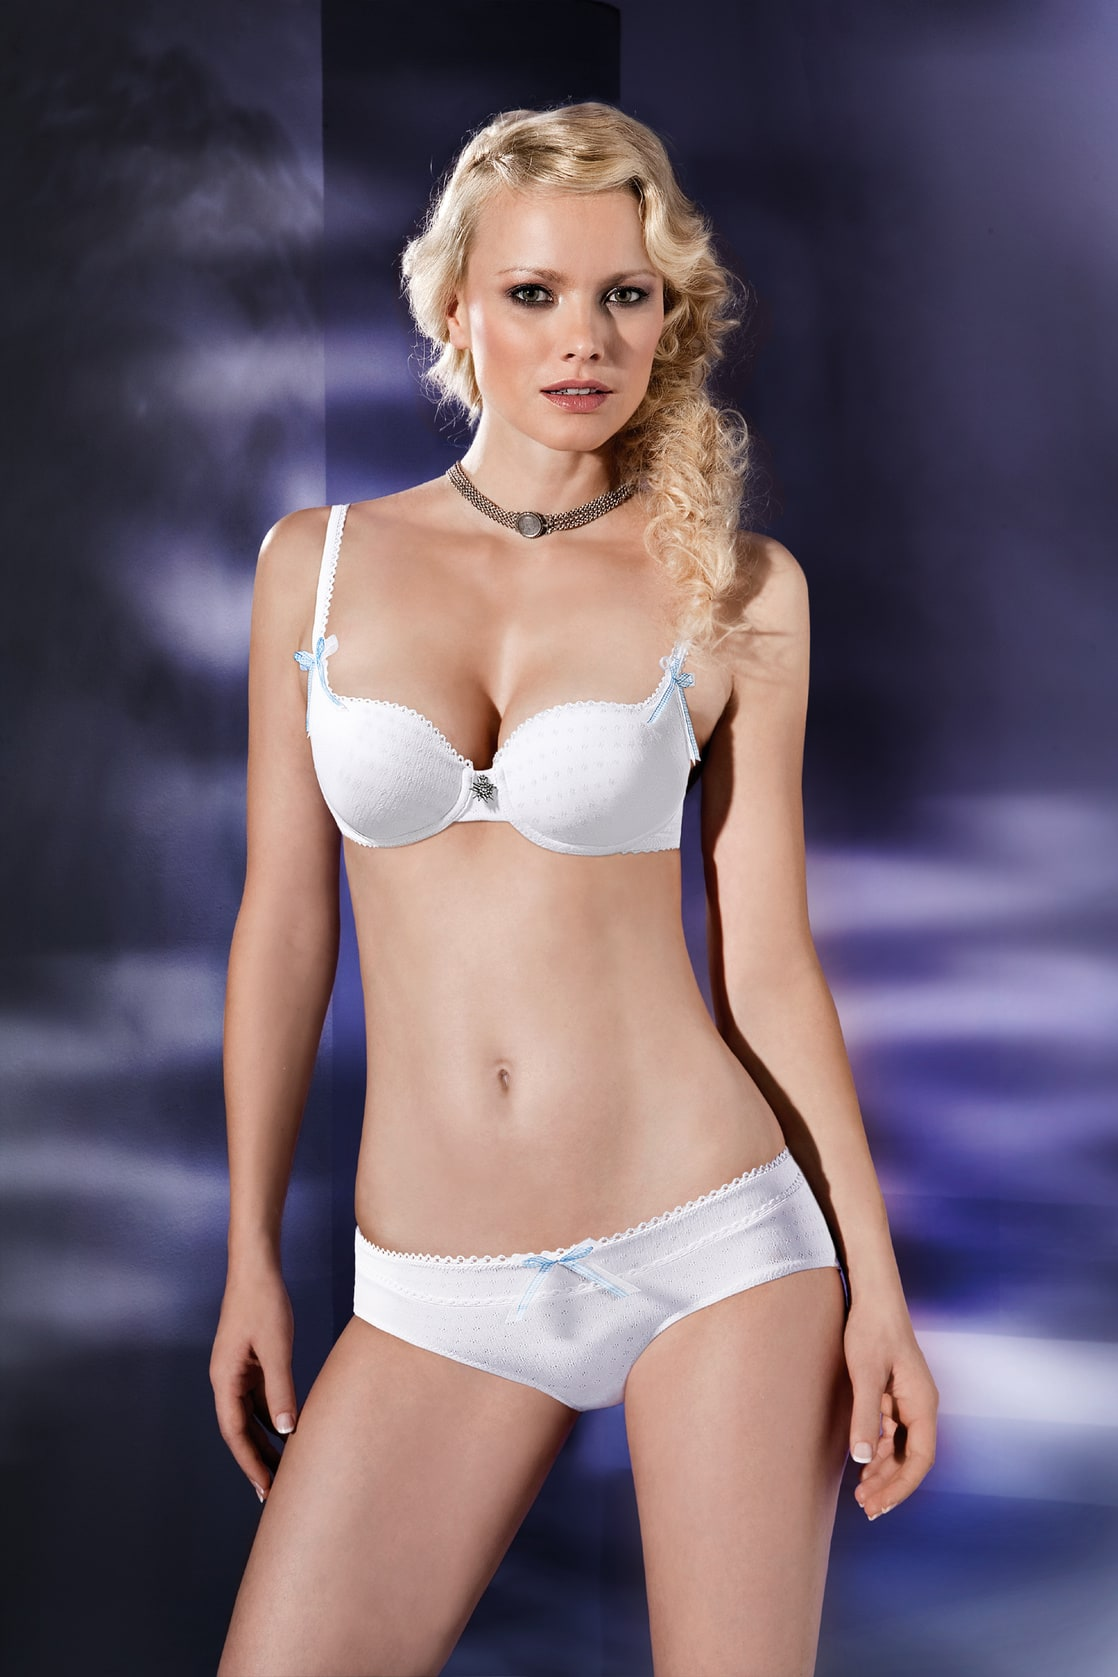 Picture of Franziska Knuppe